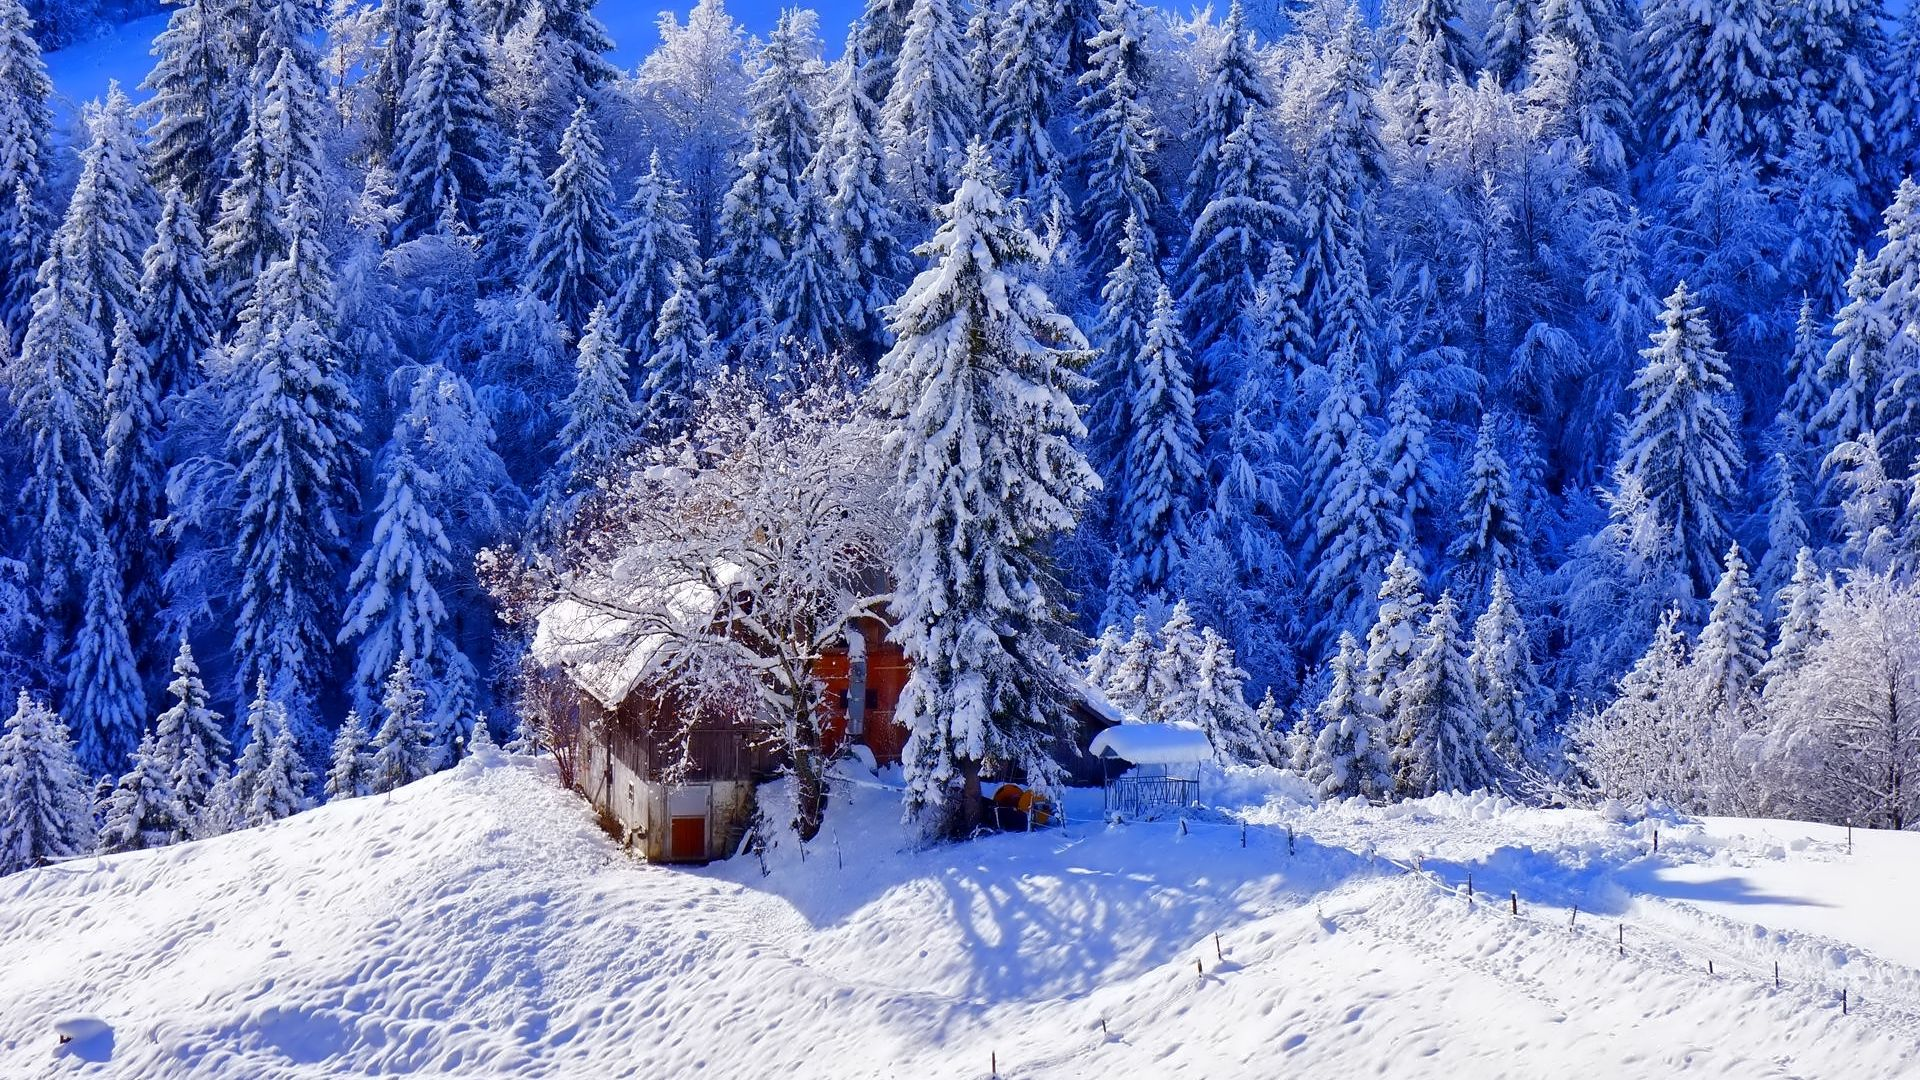 Wallpaper Iphone Winter Beautiful Nature Iphone Wallpaper Winter Beautiful Nature Wallpaper Winter Wallpaper